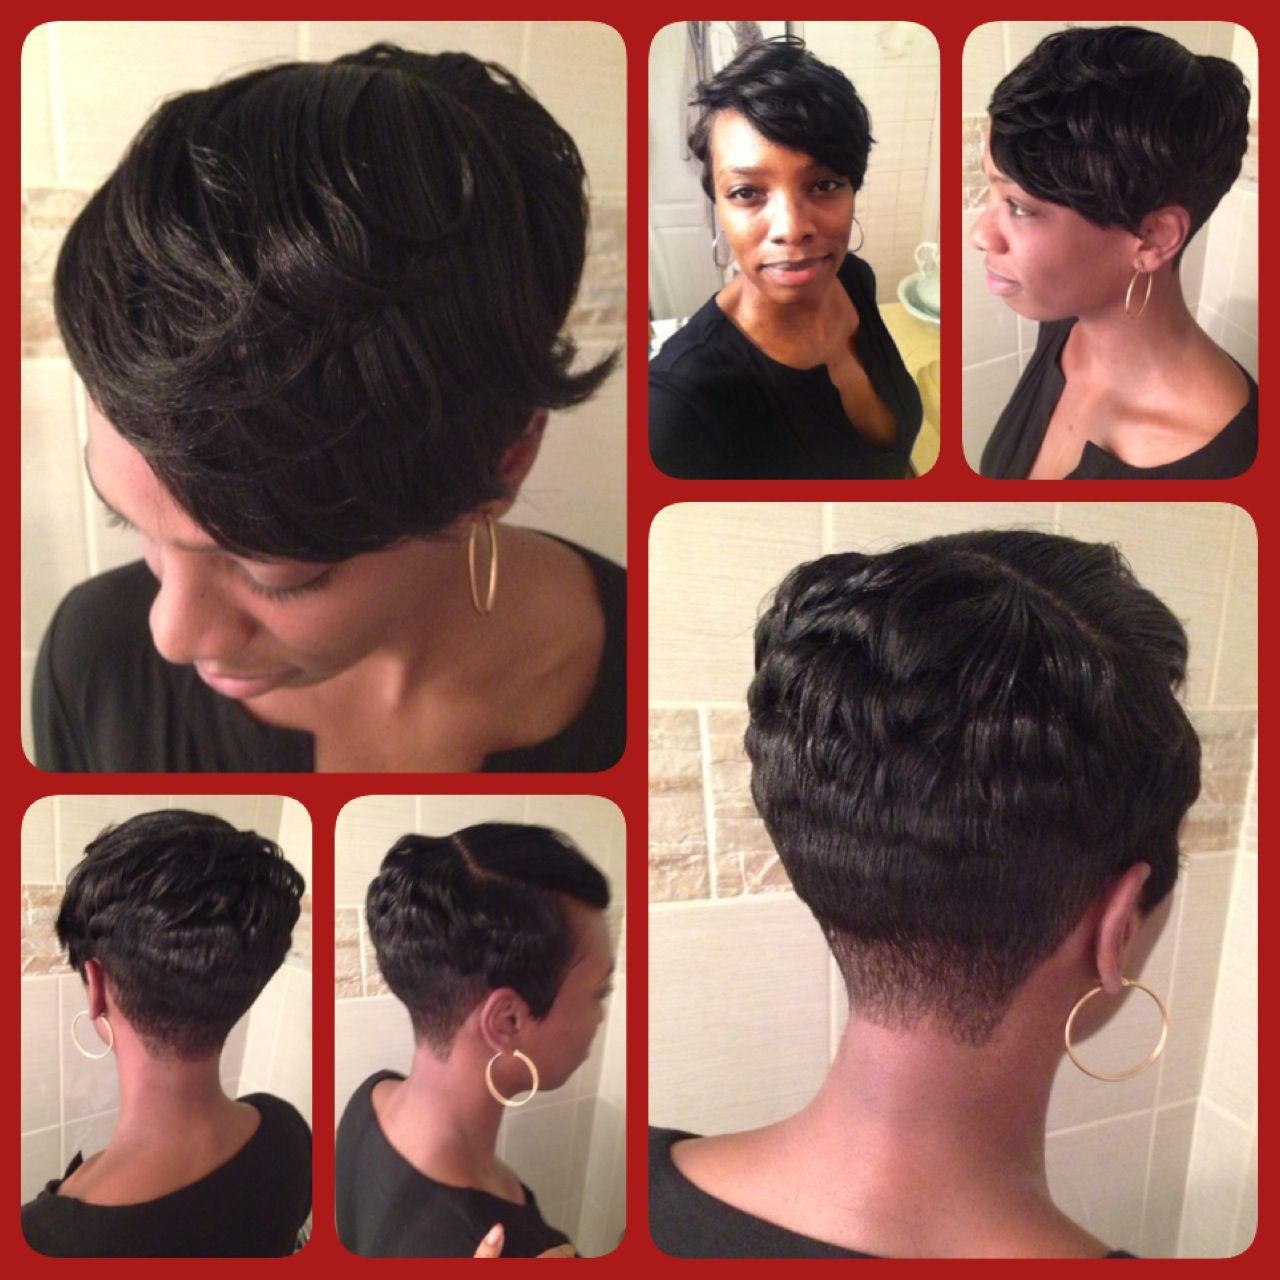 Sensational 1000 Images About My Meagan Good Short Hairstyles On Pinterest Short Hairstyles Gunalazisus